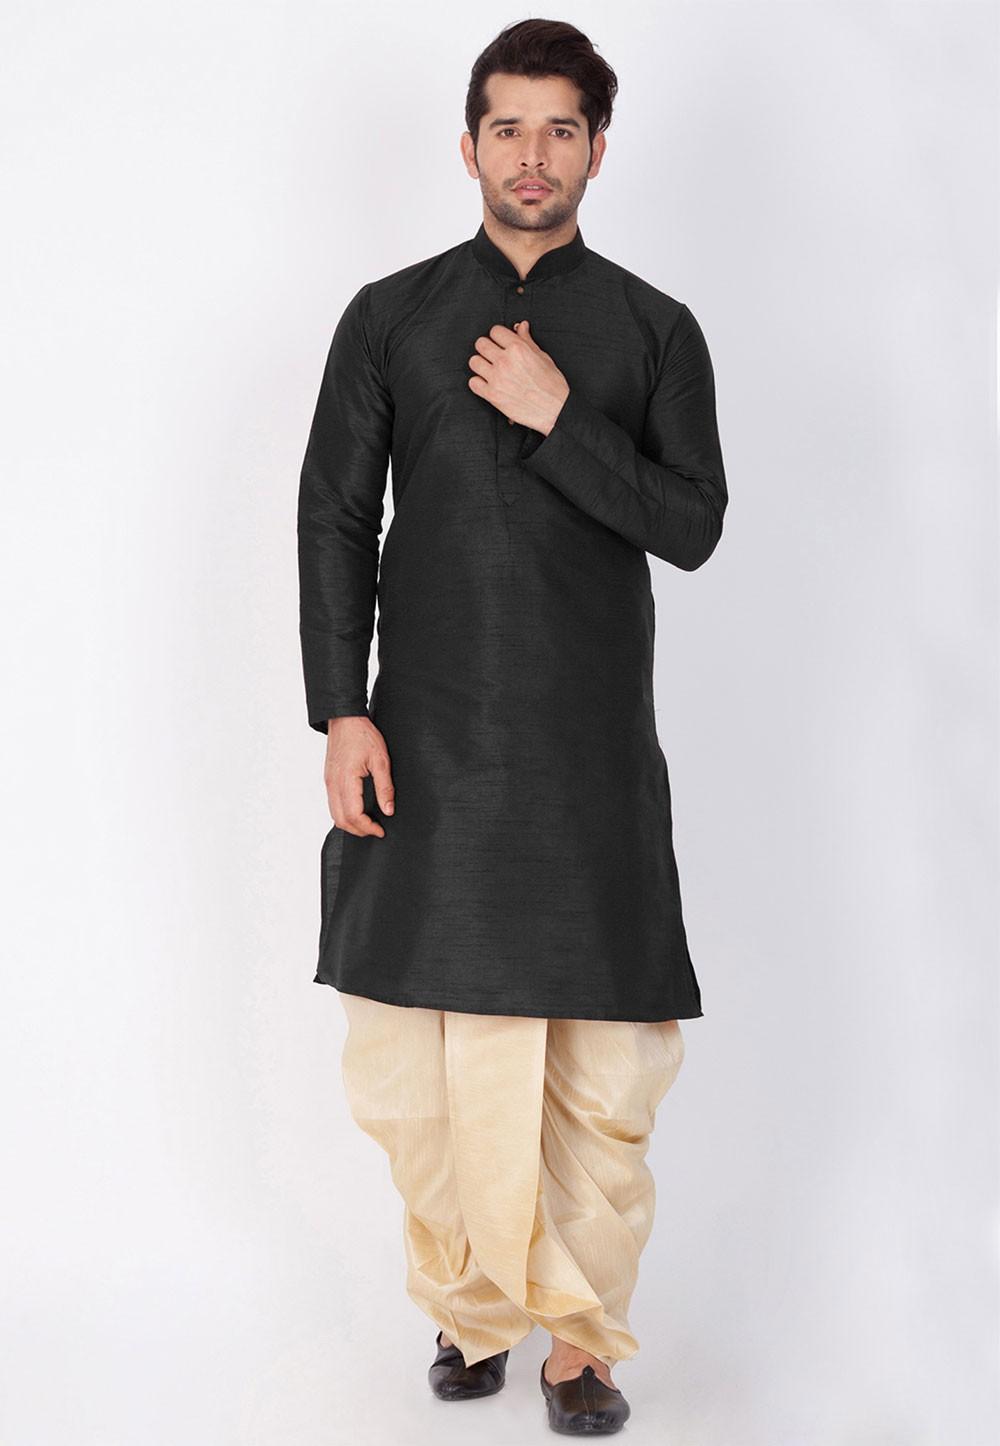 Men's Exquisite Black Color Dhoti Kurta for men